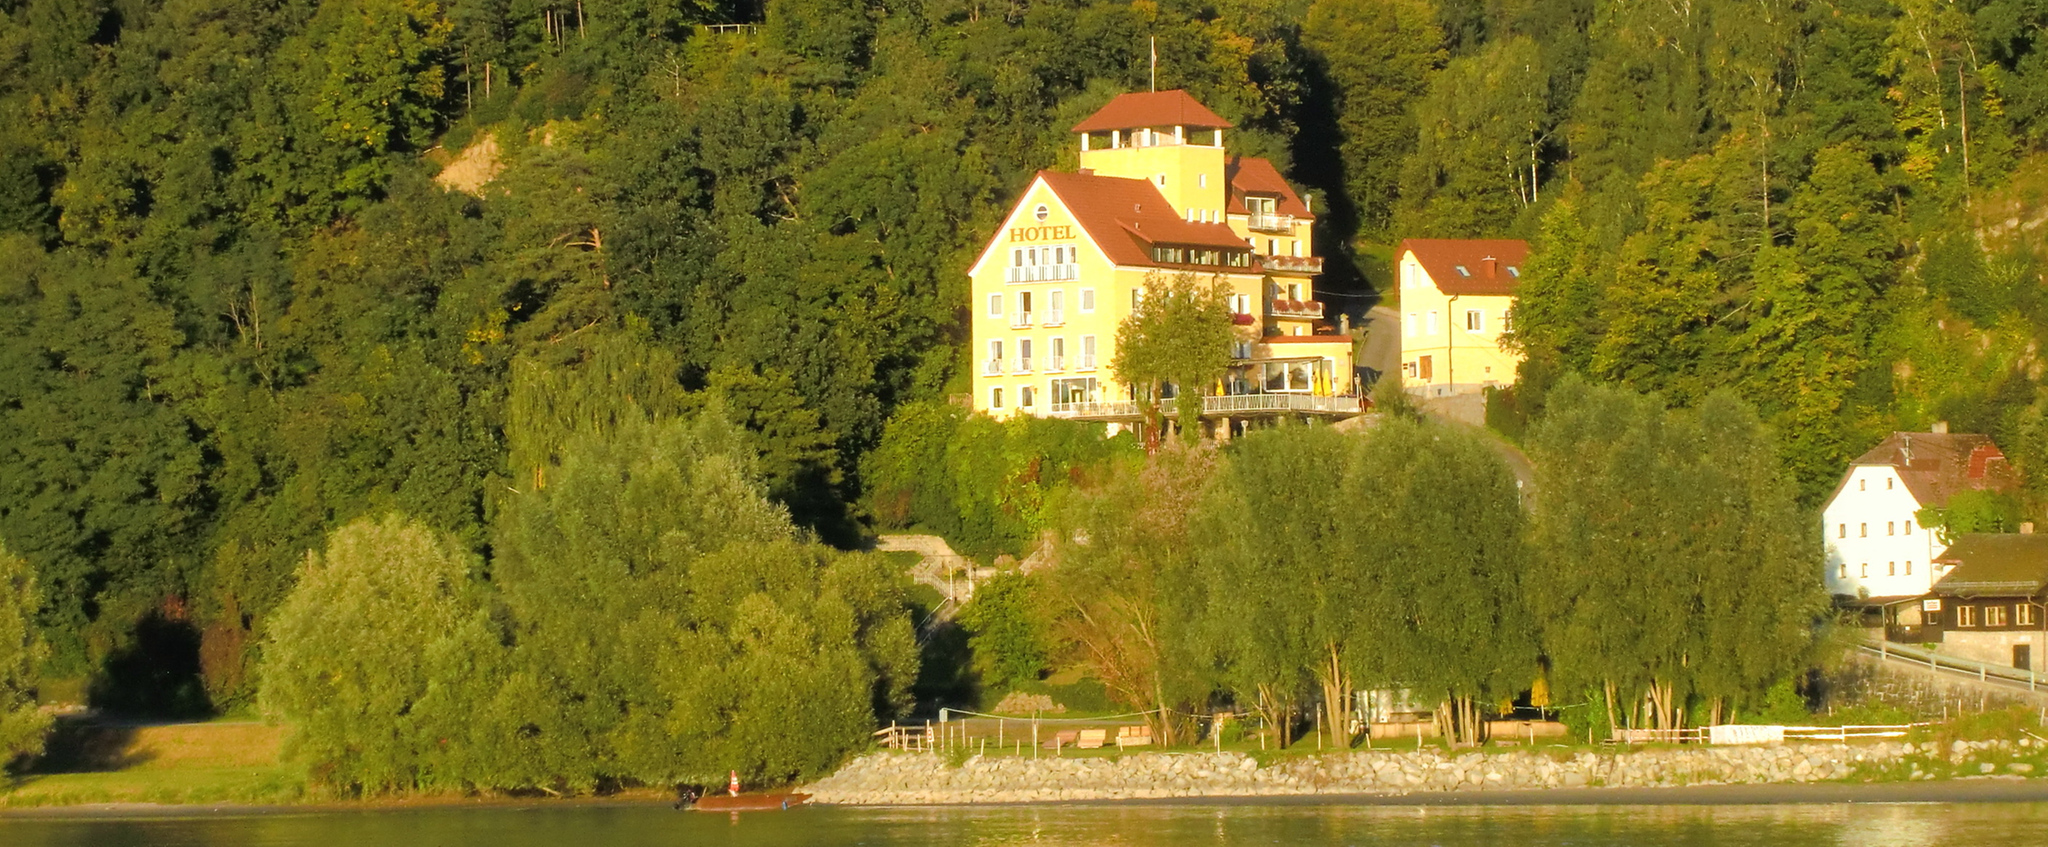 Urlaub Hotel Faustschlössl